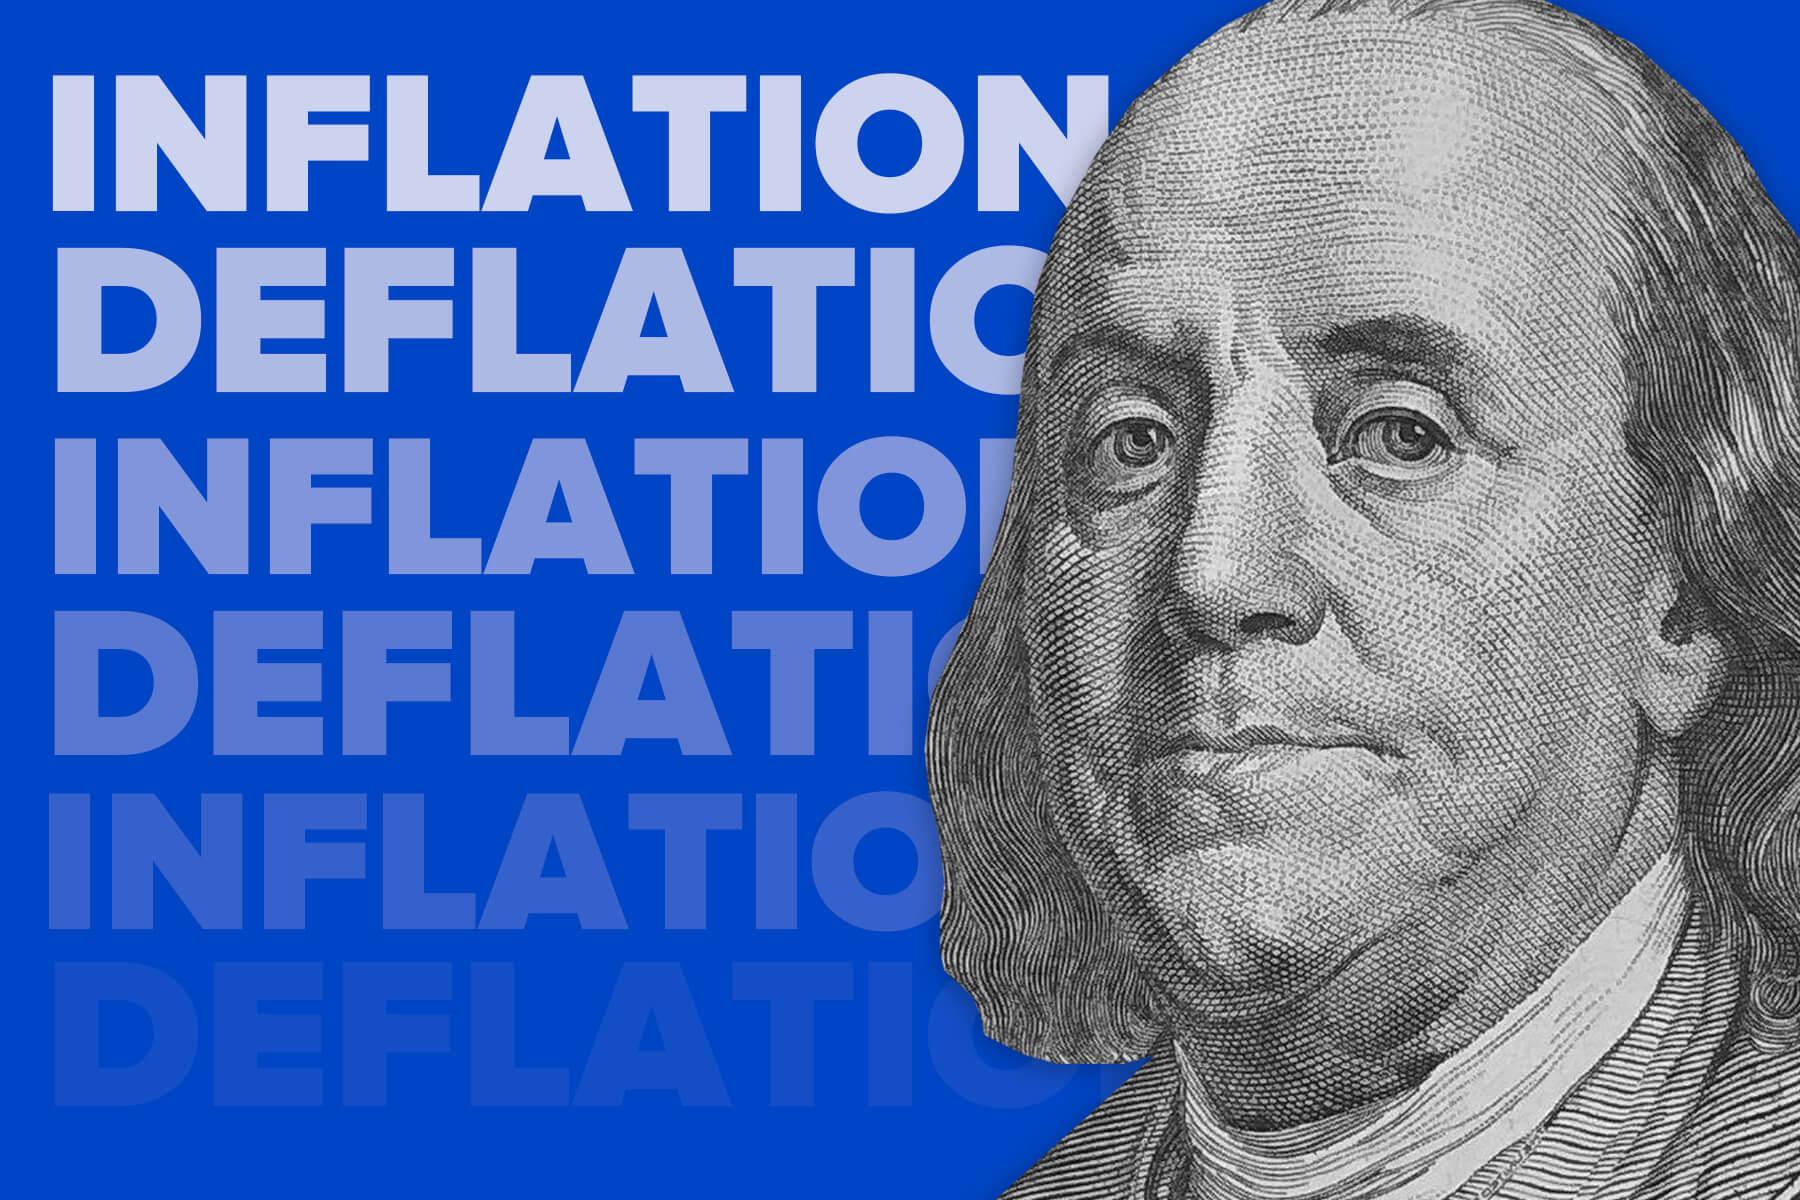 Is Coronavirus Crisis Leading Us to Global Deflation or Inflation?